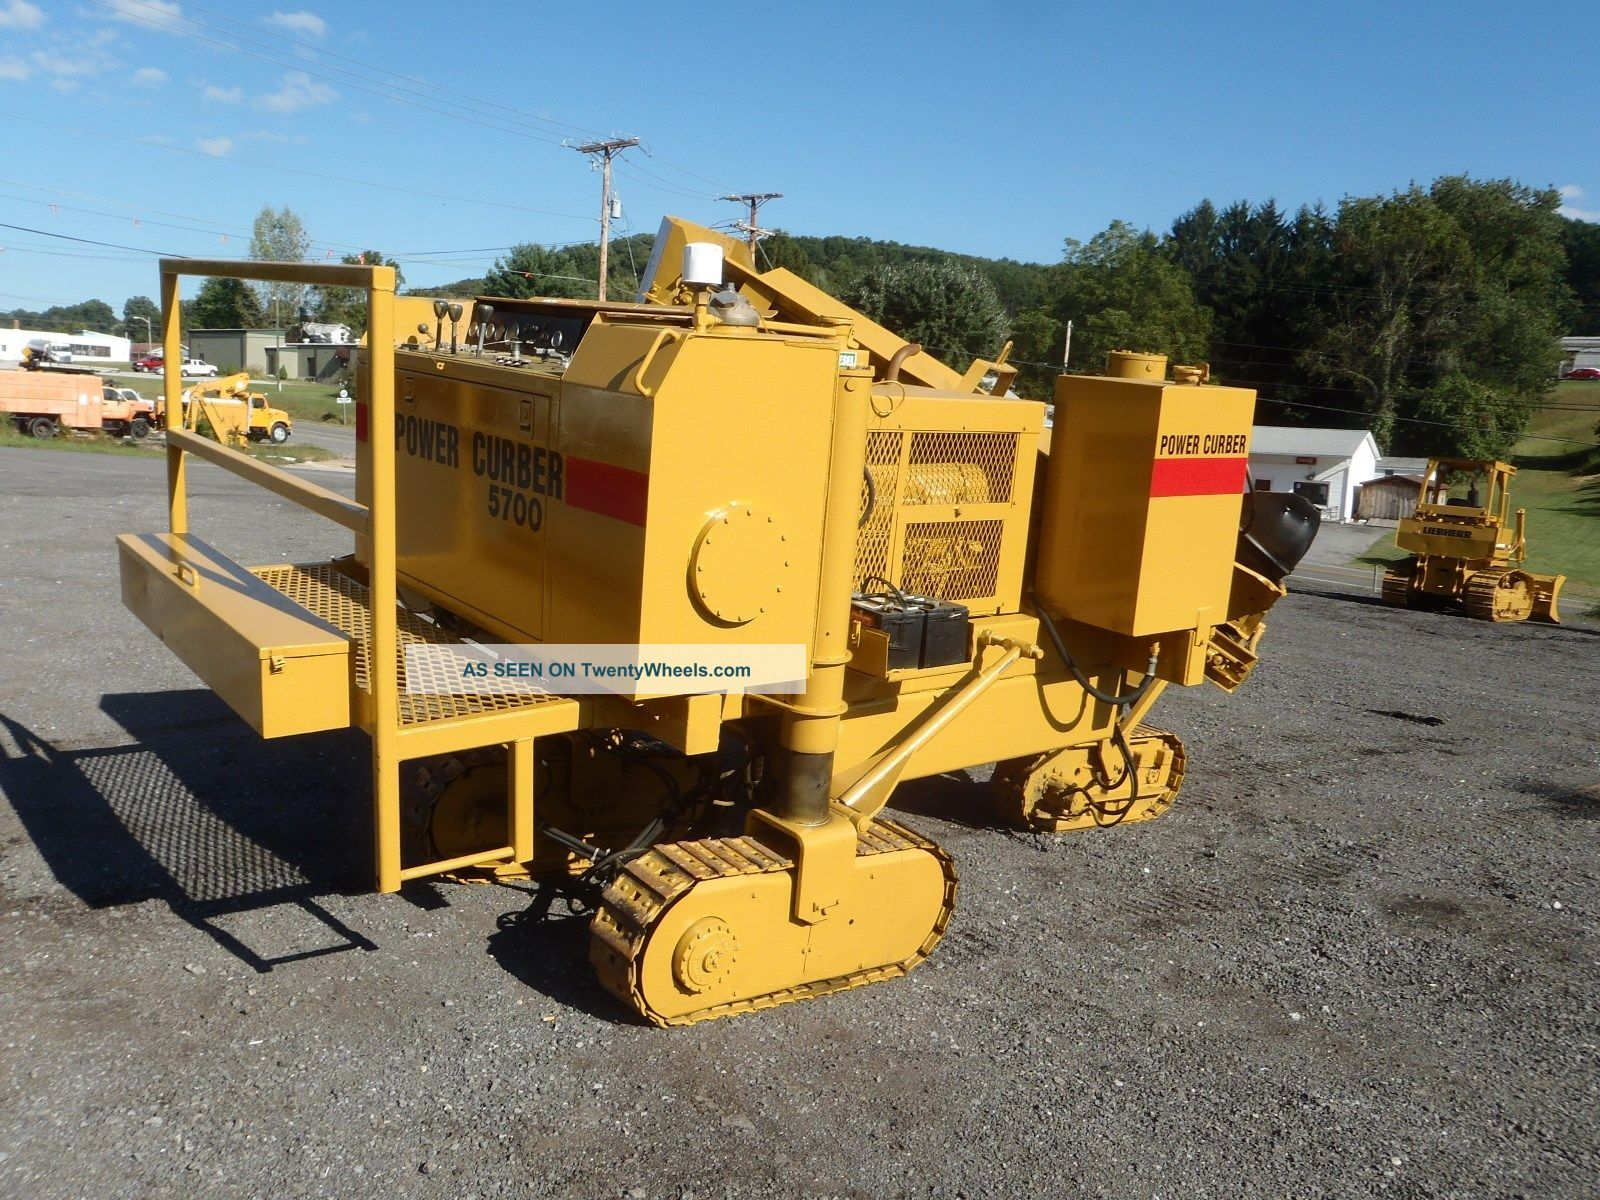 Power Curber 5700 Concrete Curbing Machine